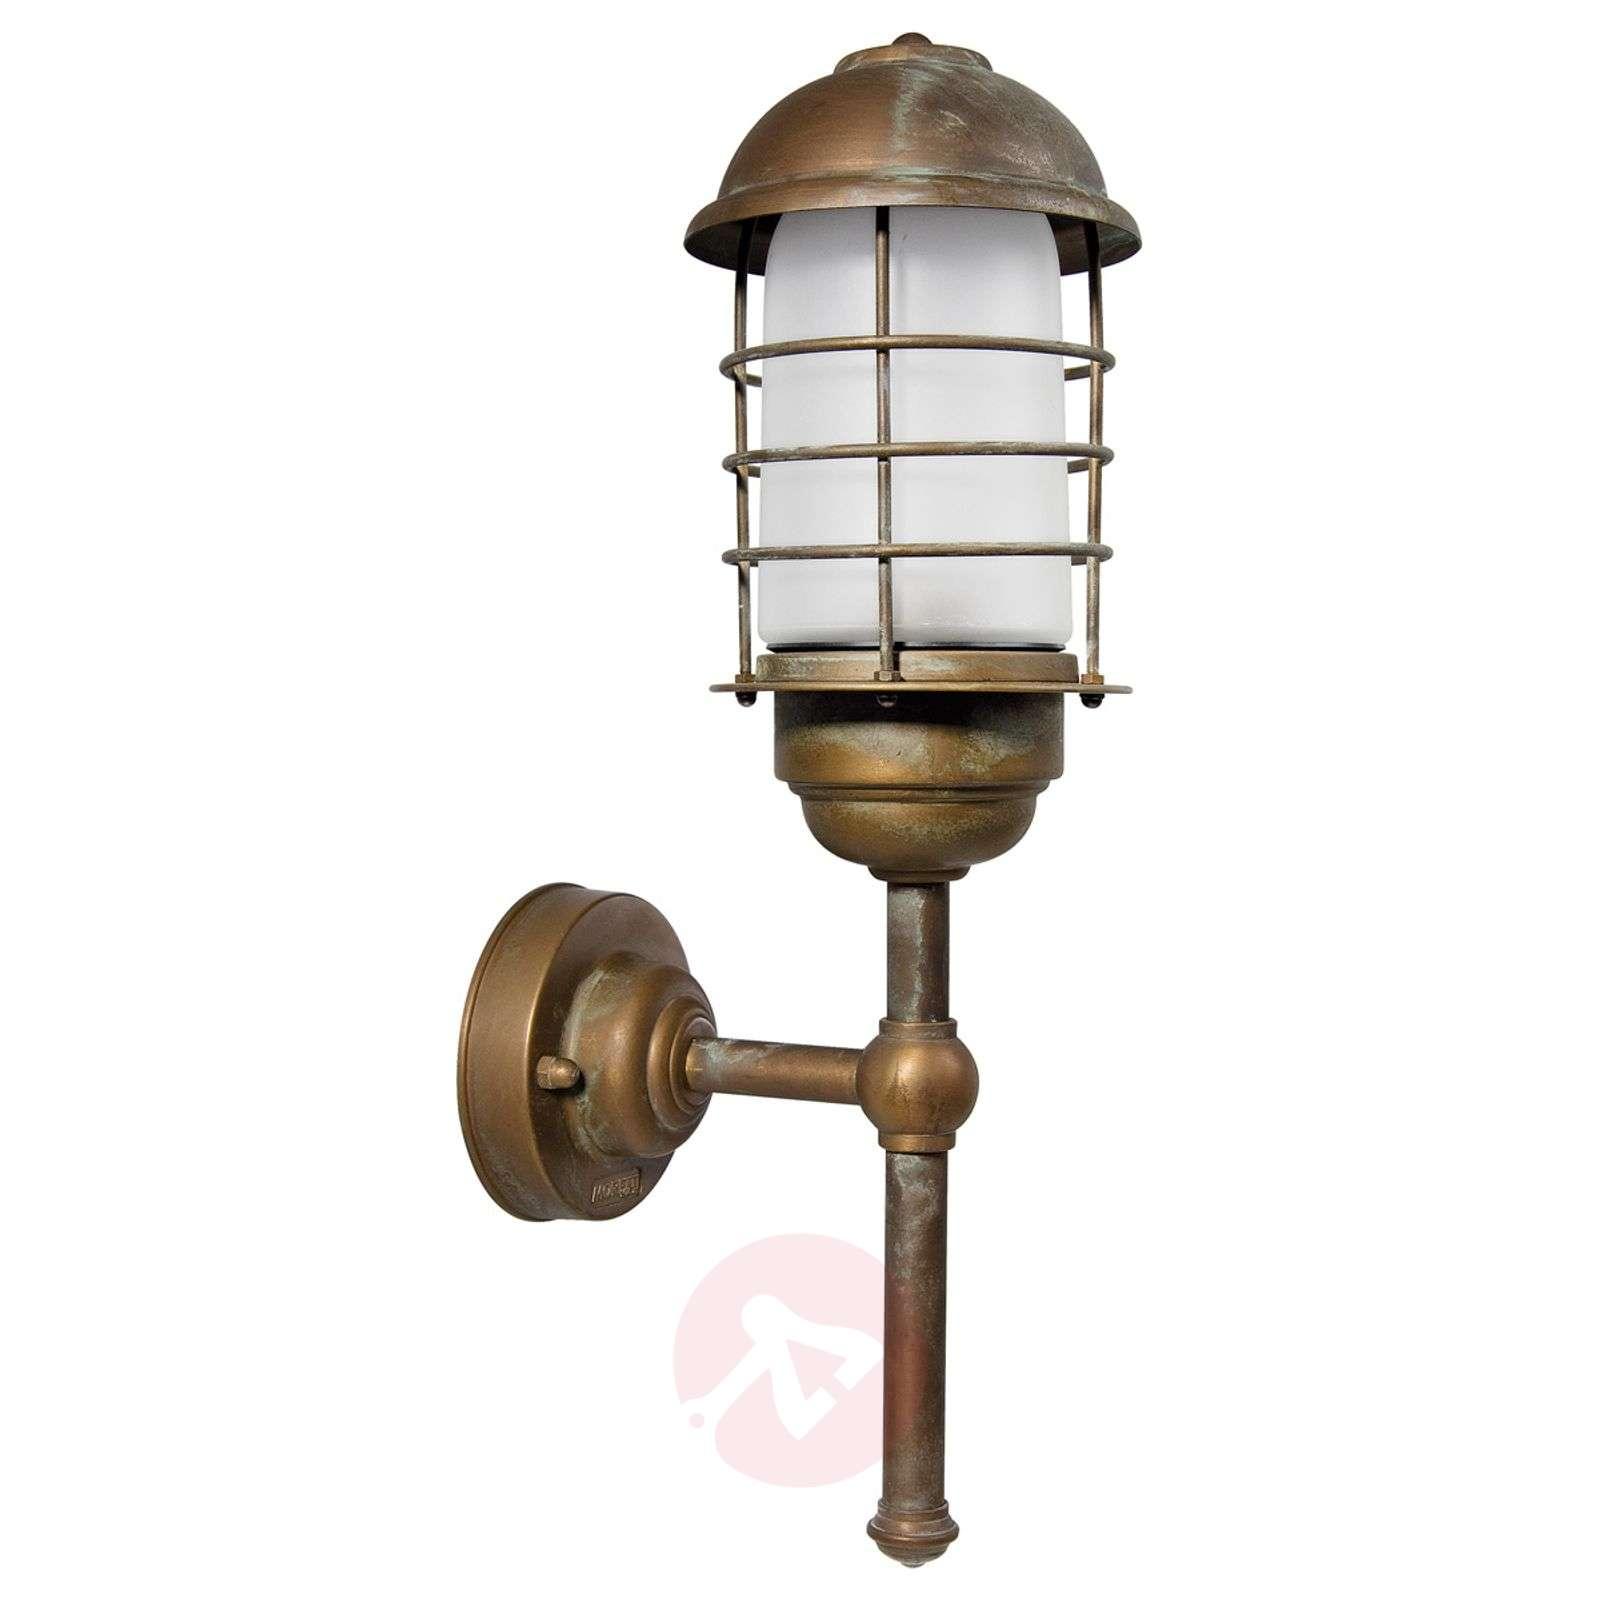 Seawater-resistant outdoor wall light Carlon-6515244-01